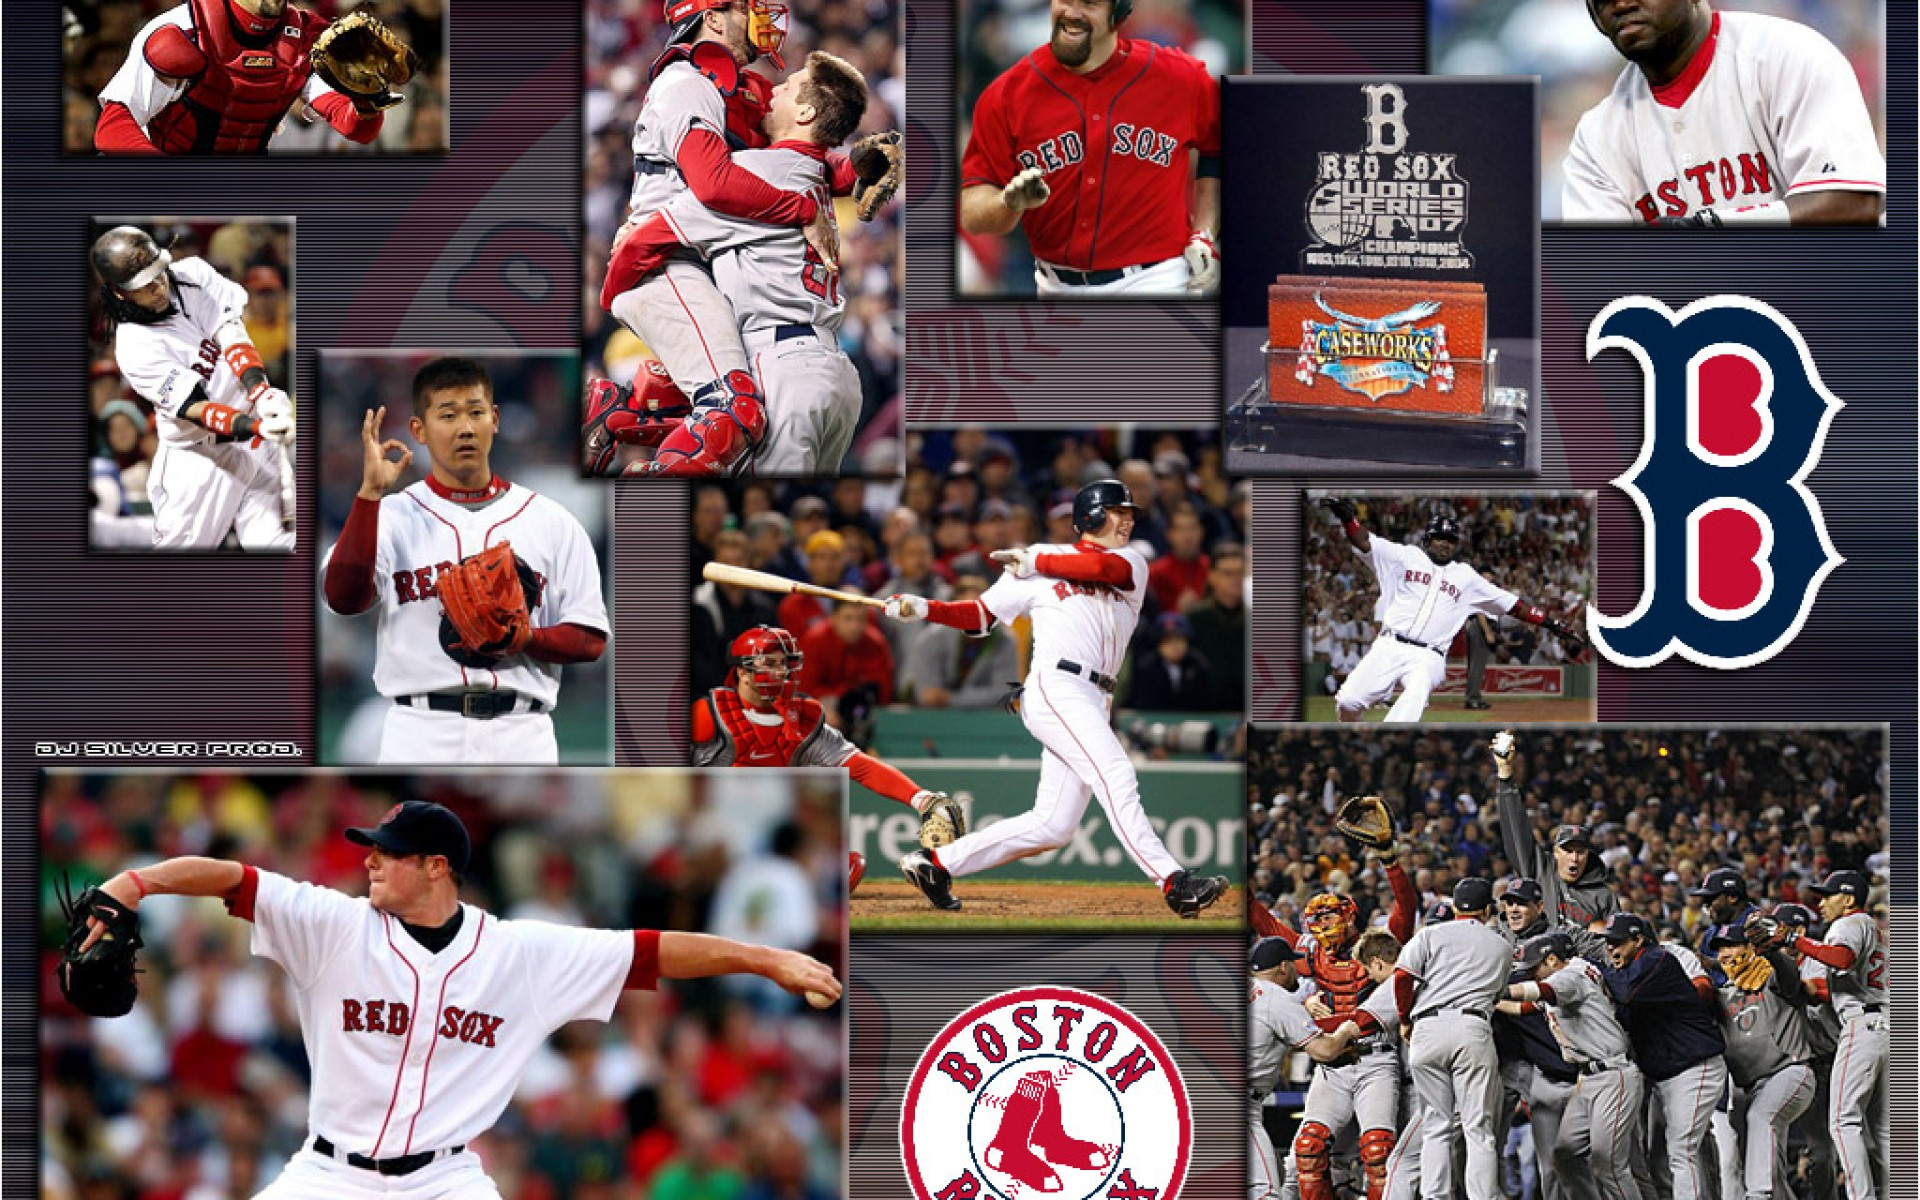 BOSTON RED SOX baseball mlb gh wallpaper 1920x1200 158192 1920x1200